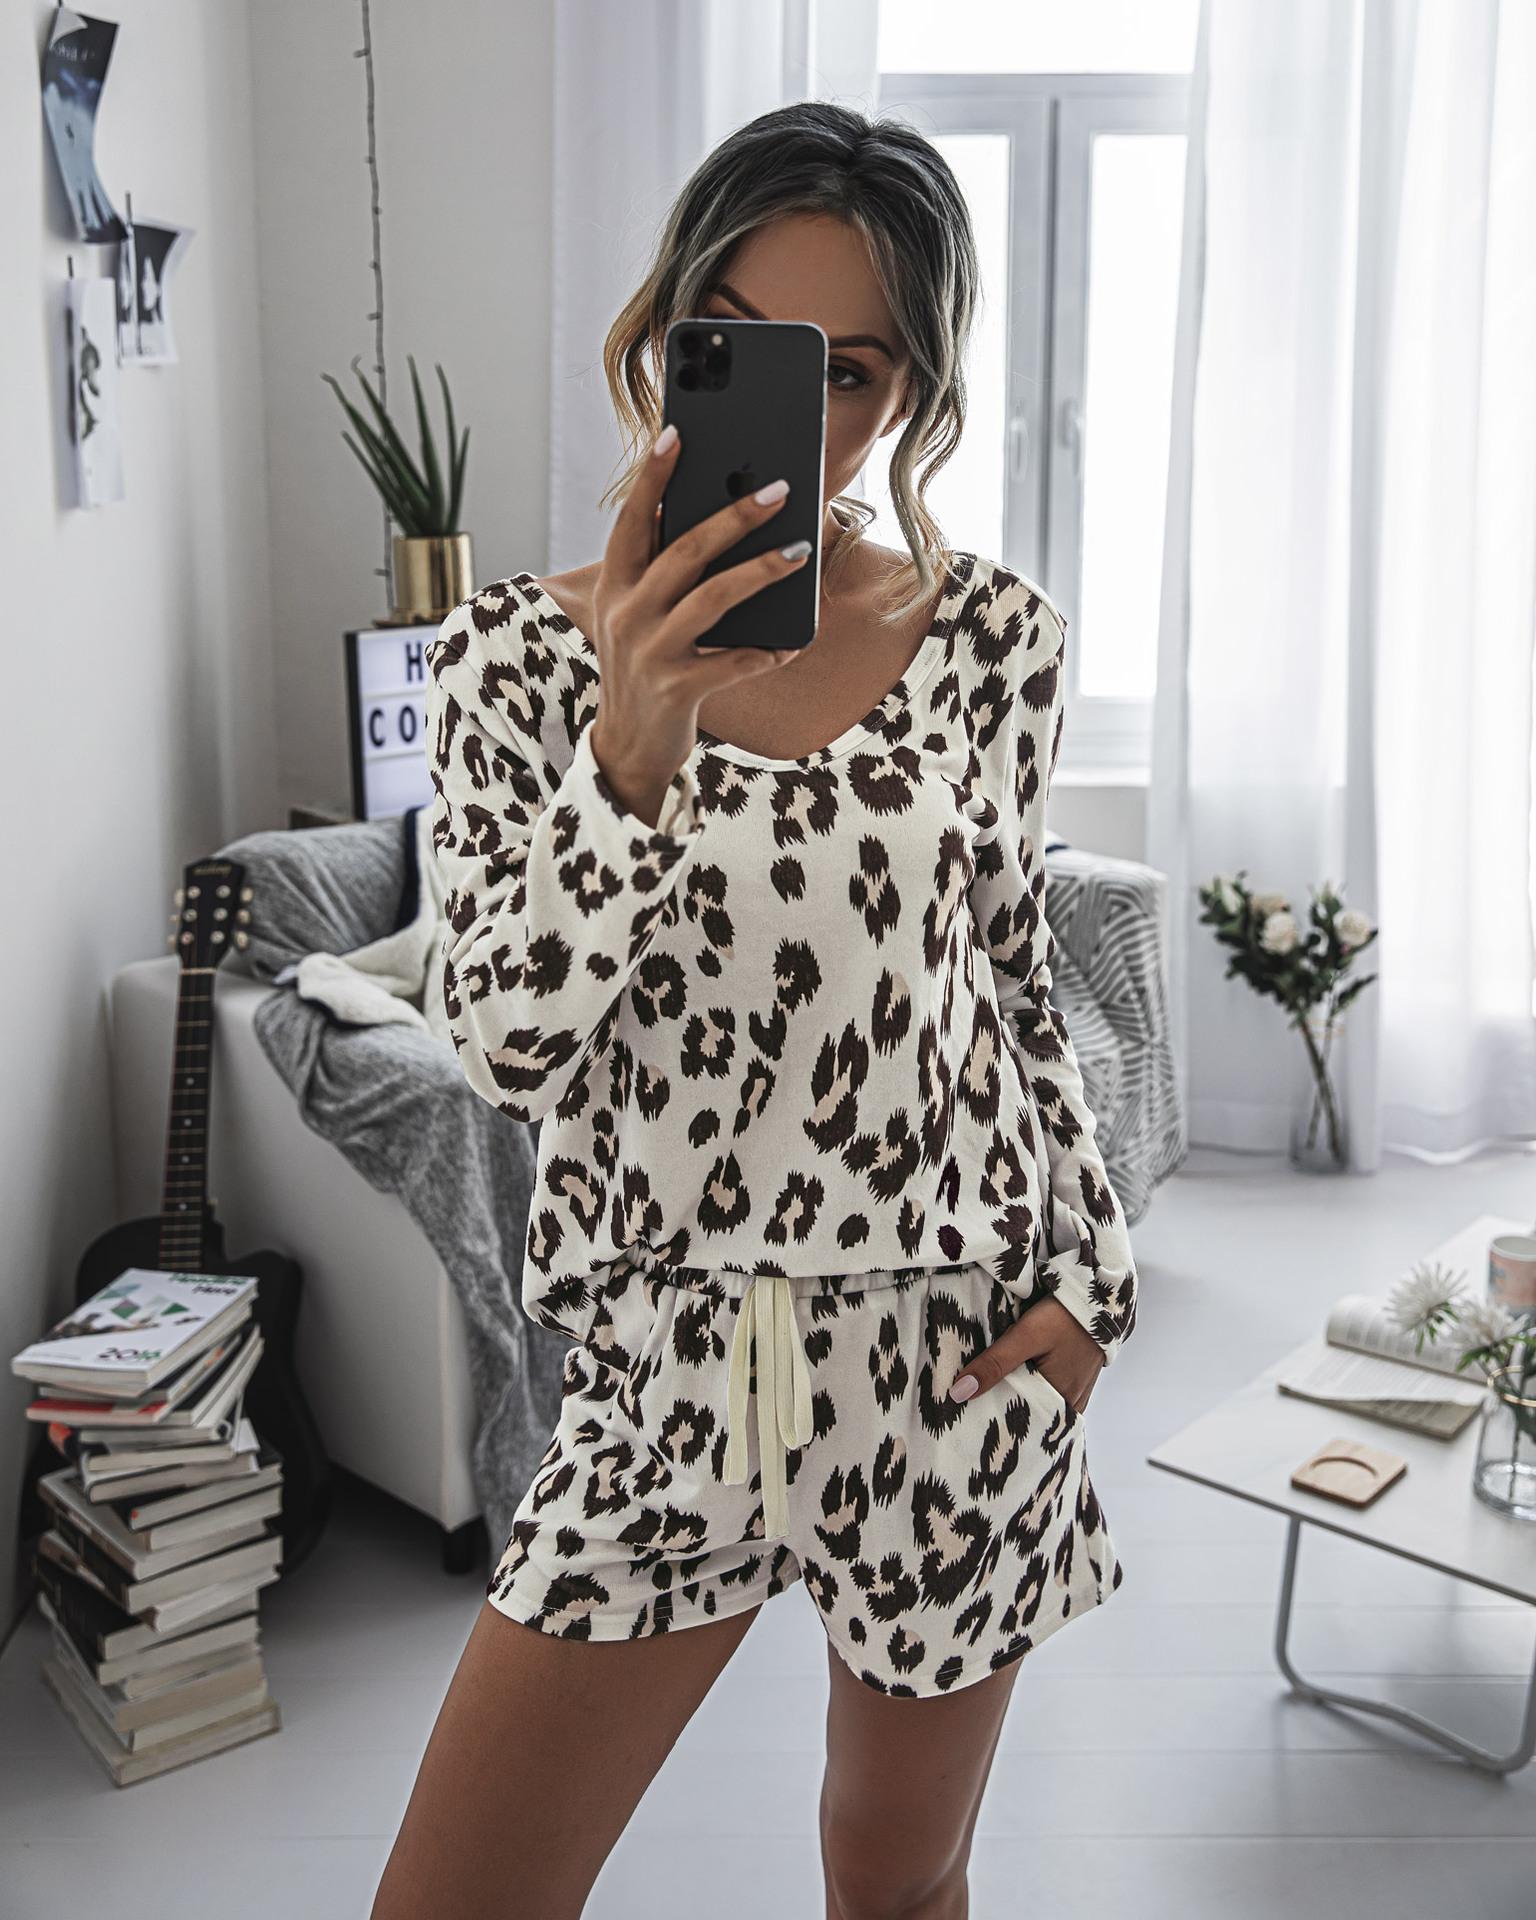 2020 Musim Panas Wanita Pendek Leopard Piyama Set Atasan Lengan Panjang dan Celana Pendek PJ Set 2 Buah Baju Tidur Santai Baju Tidur Pakaian Rumah